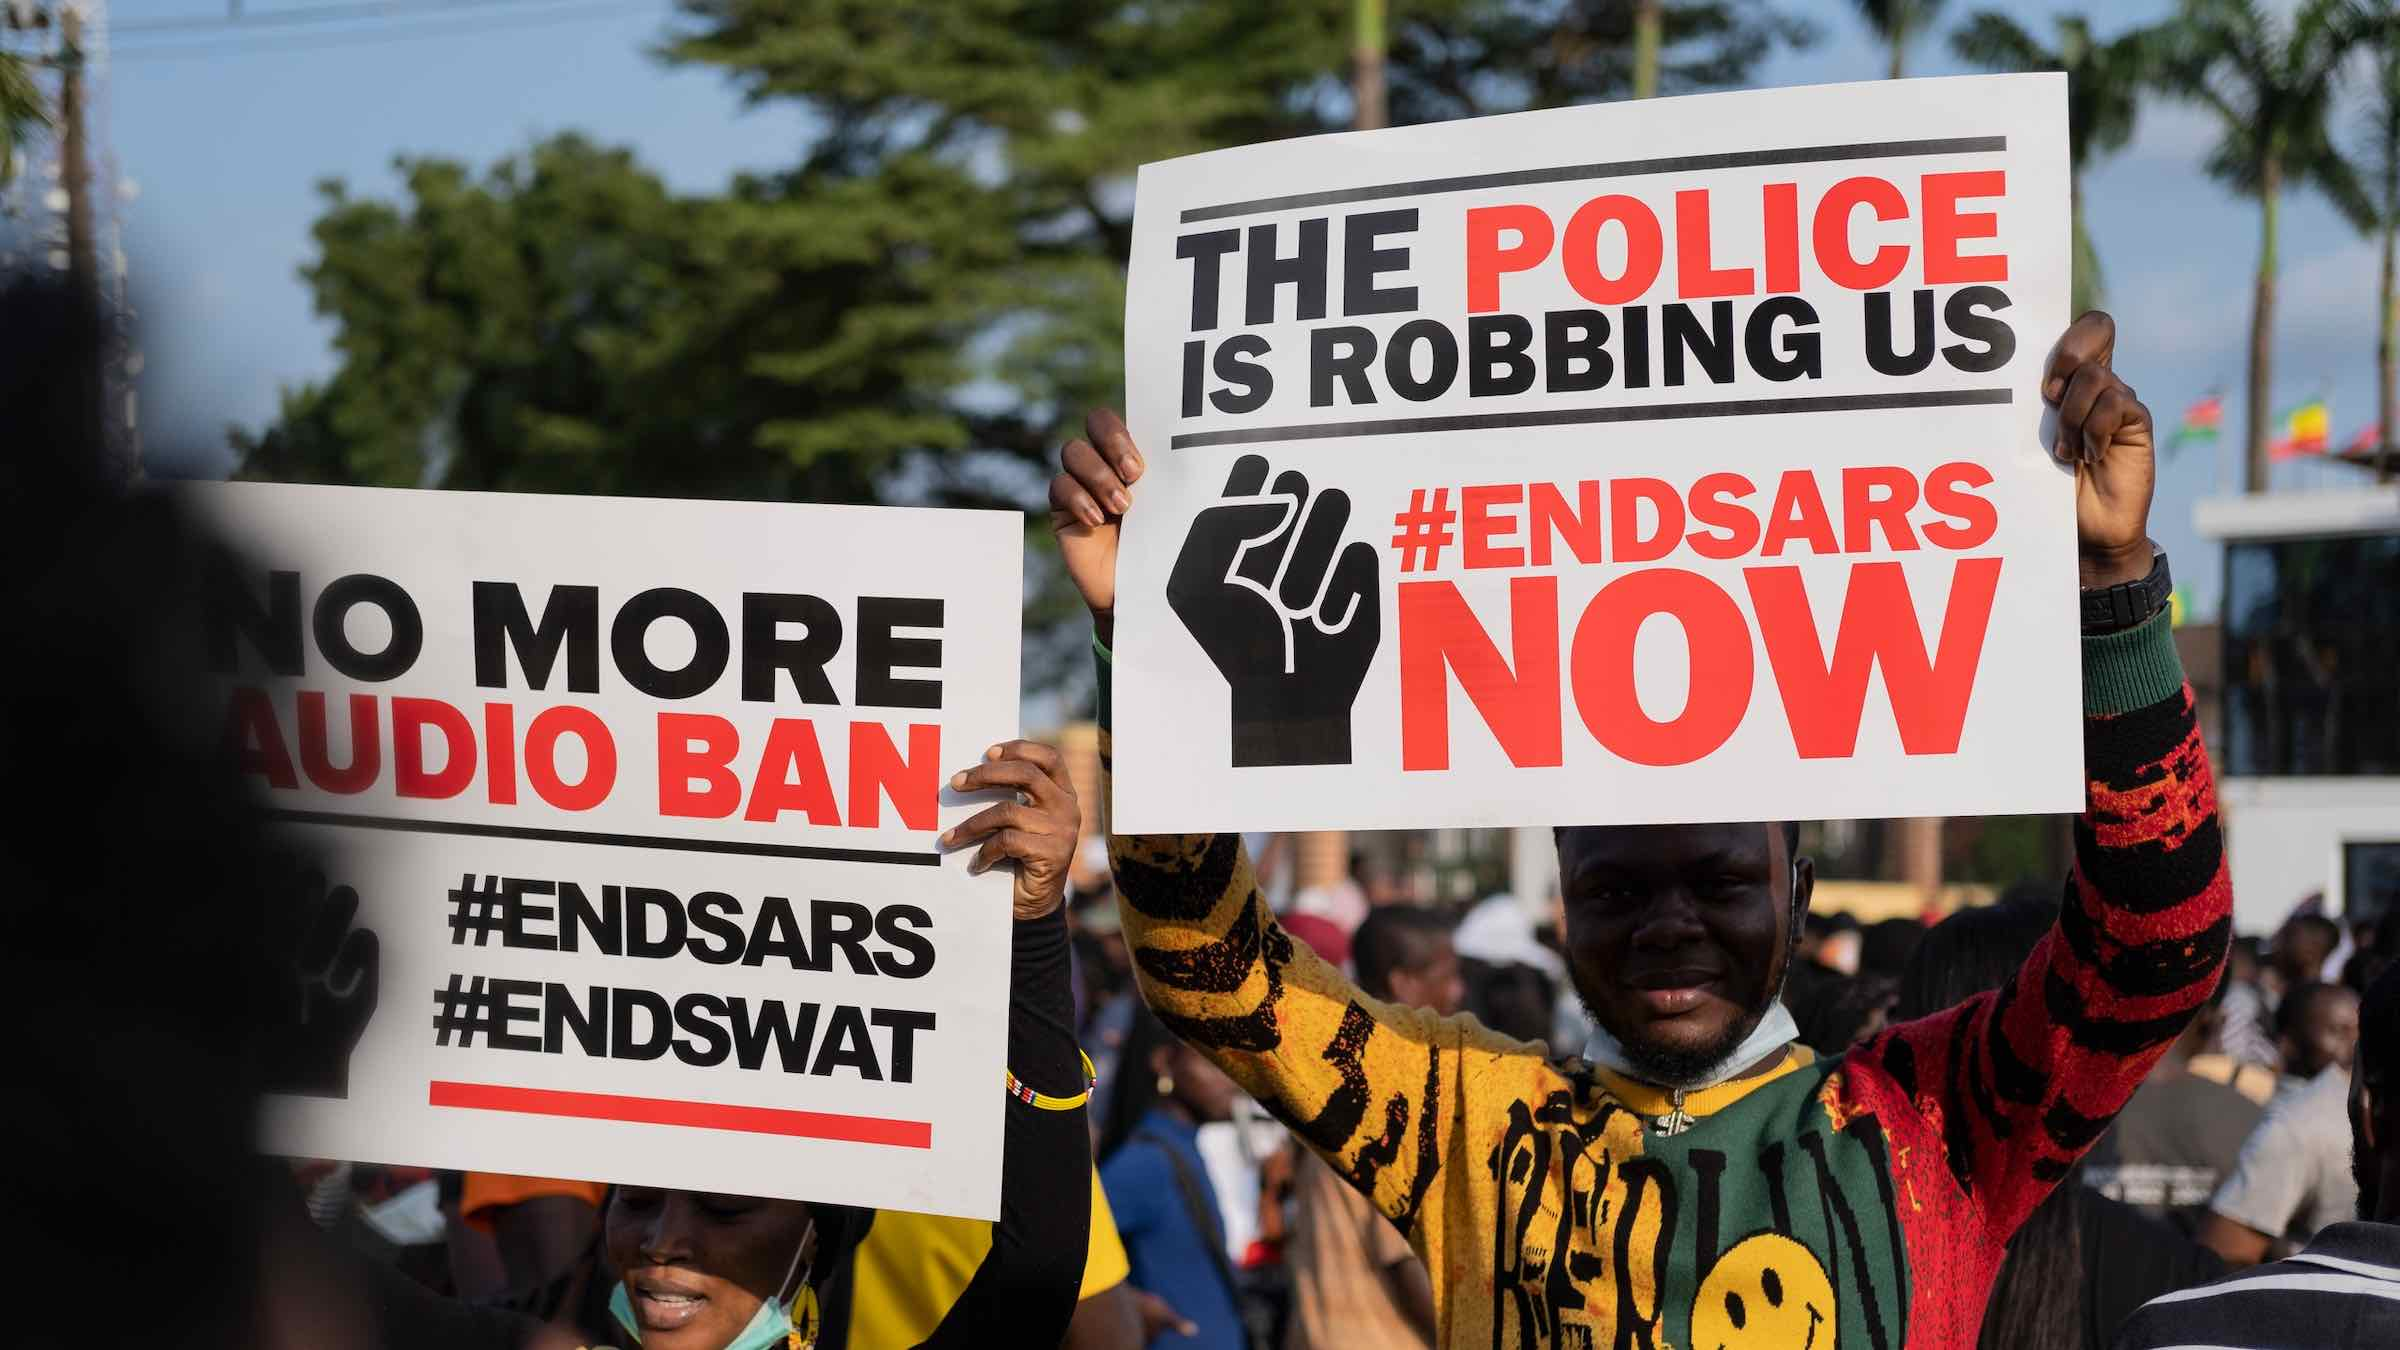 An #EndSARS demonstration in Nigeria